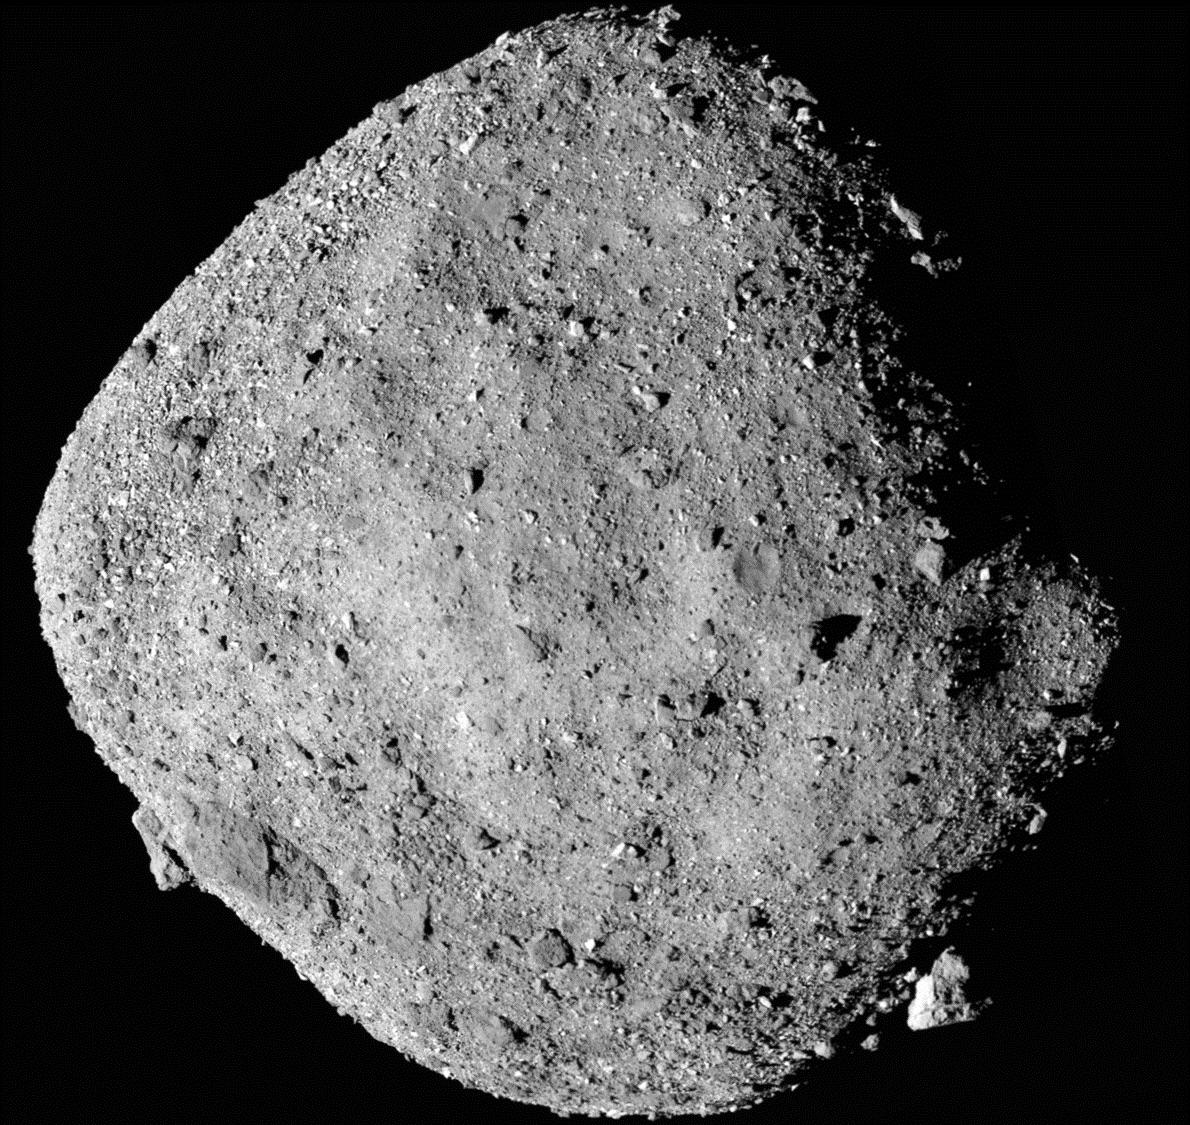 Meteor-Asteroidal